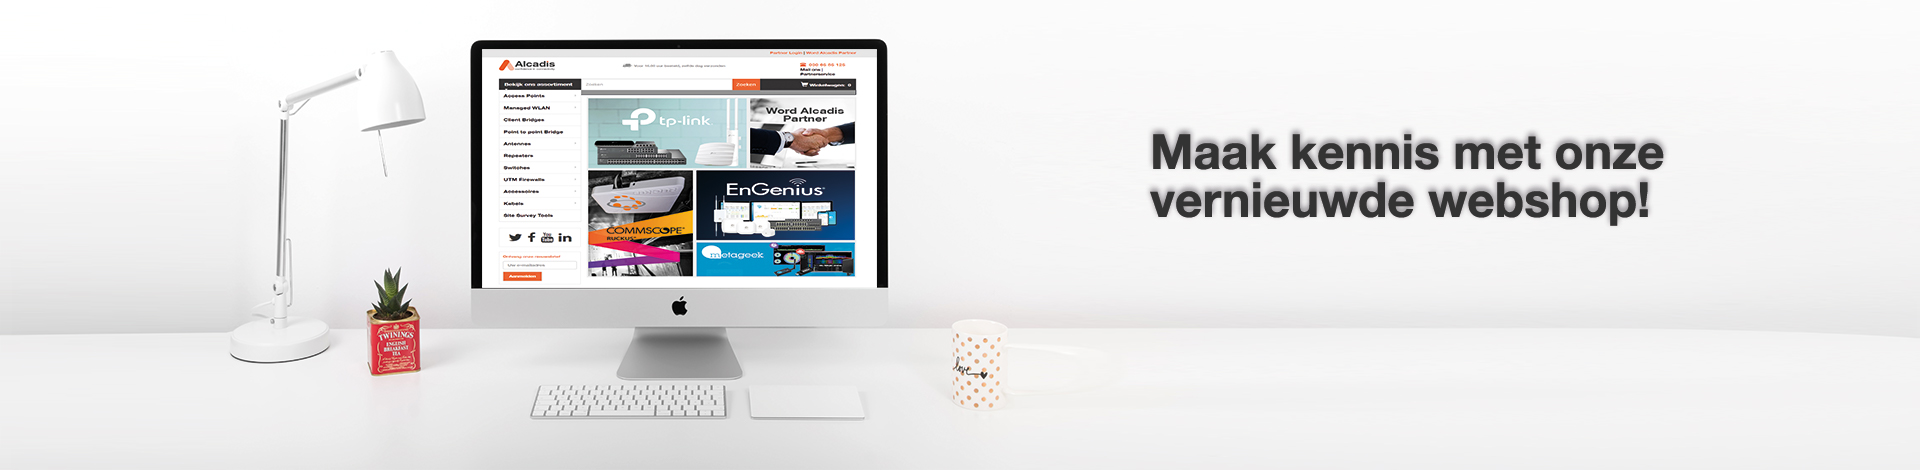 Vernieuwde webshop Alcadis